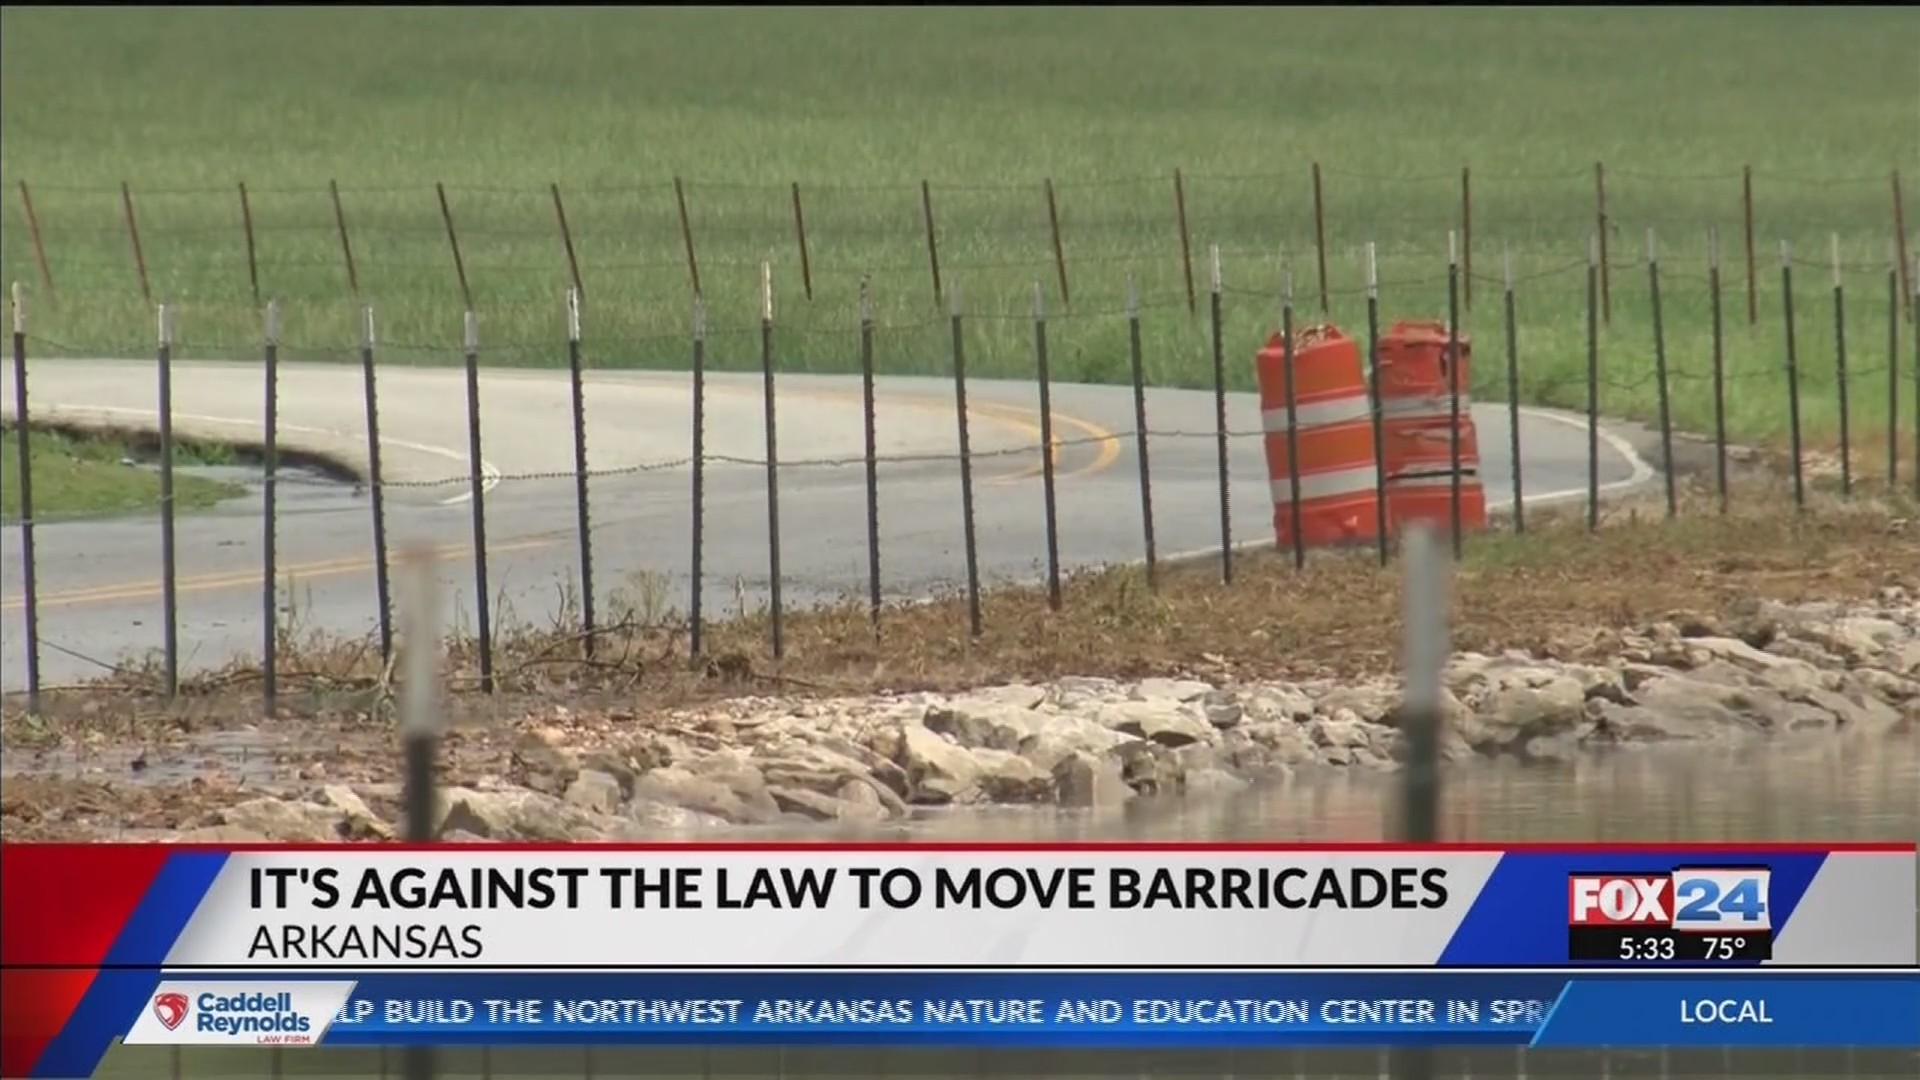 Benton_County_Officials__Don_t_Move_Barr_0_20190507001352